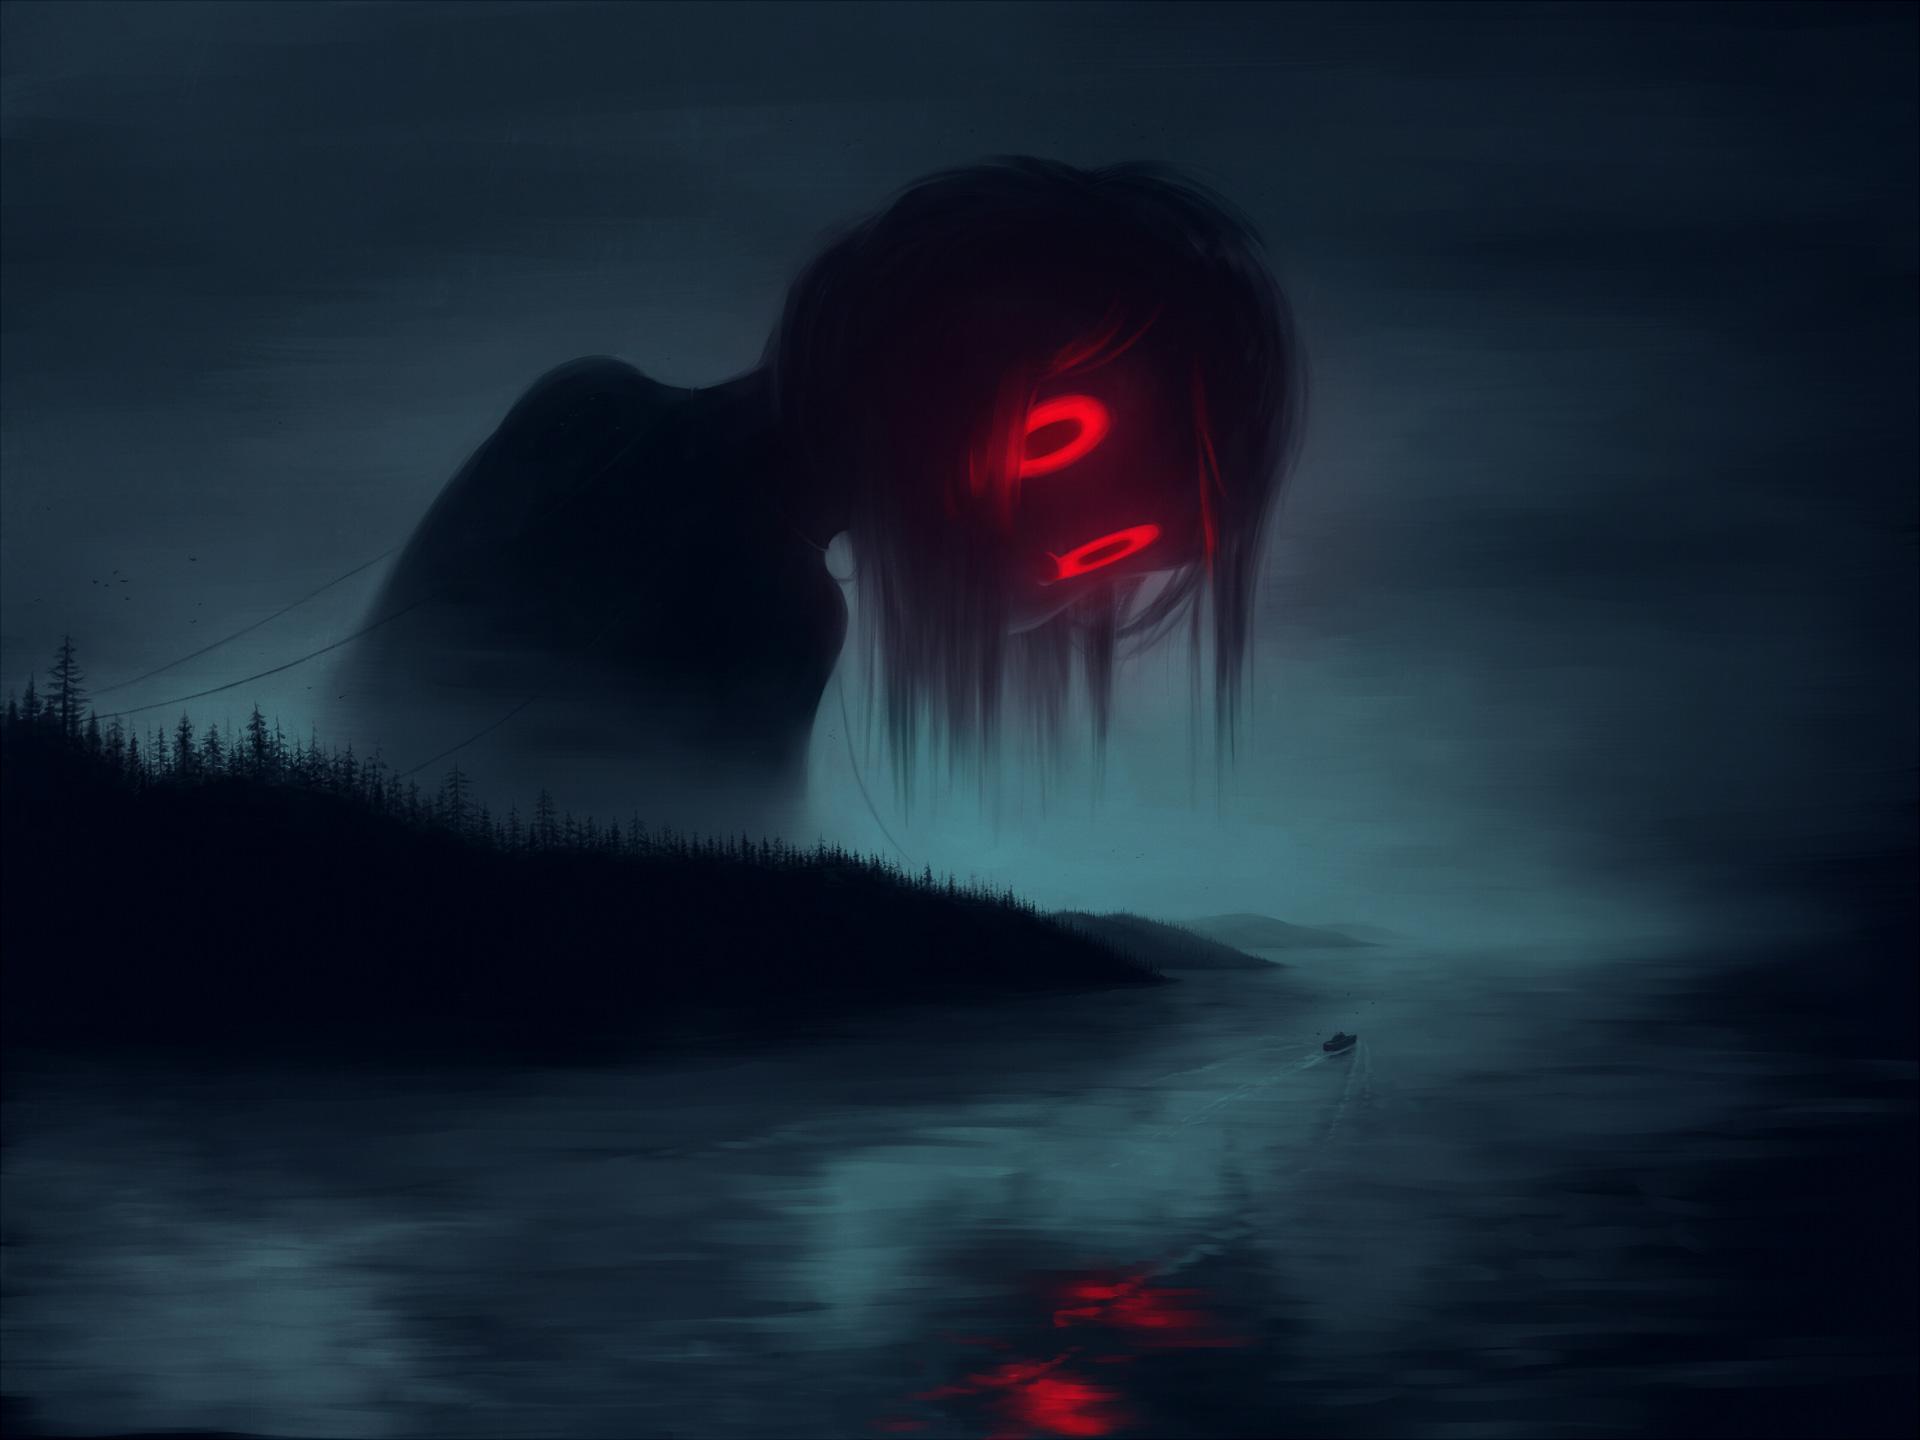 Giant Girl With Big Red Eyes Artwork Hd Artist 4k